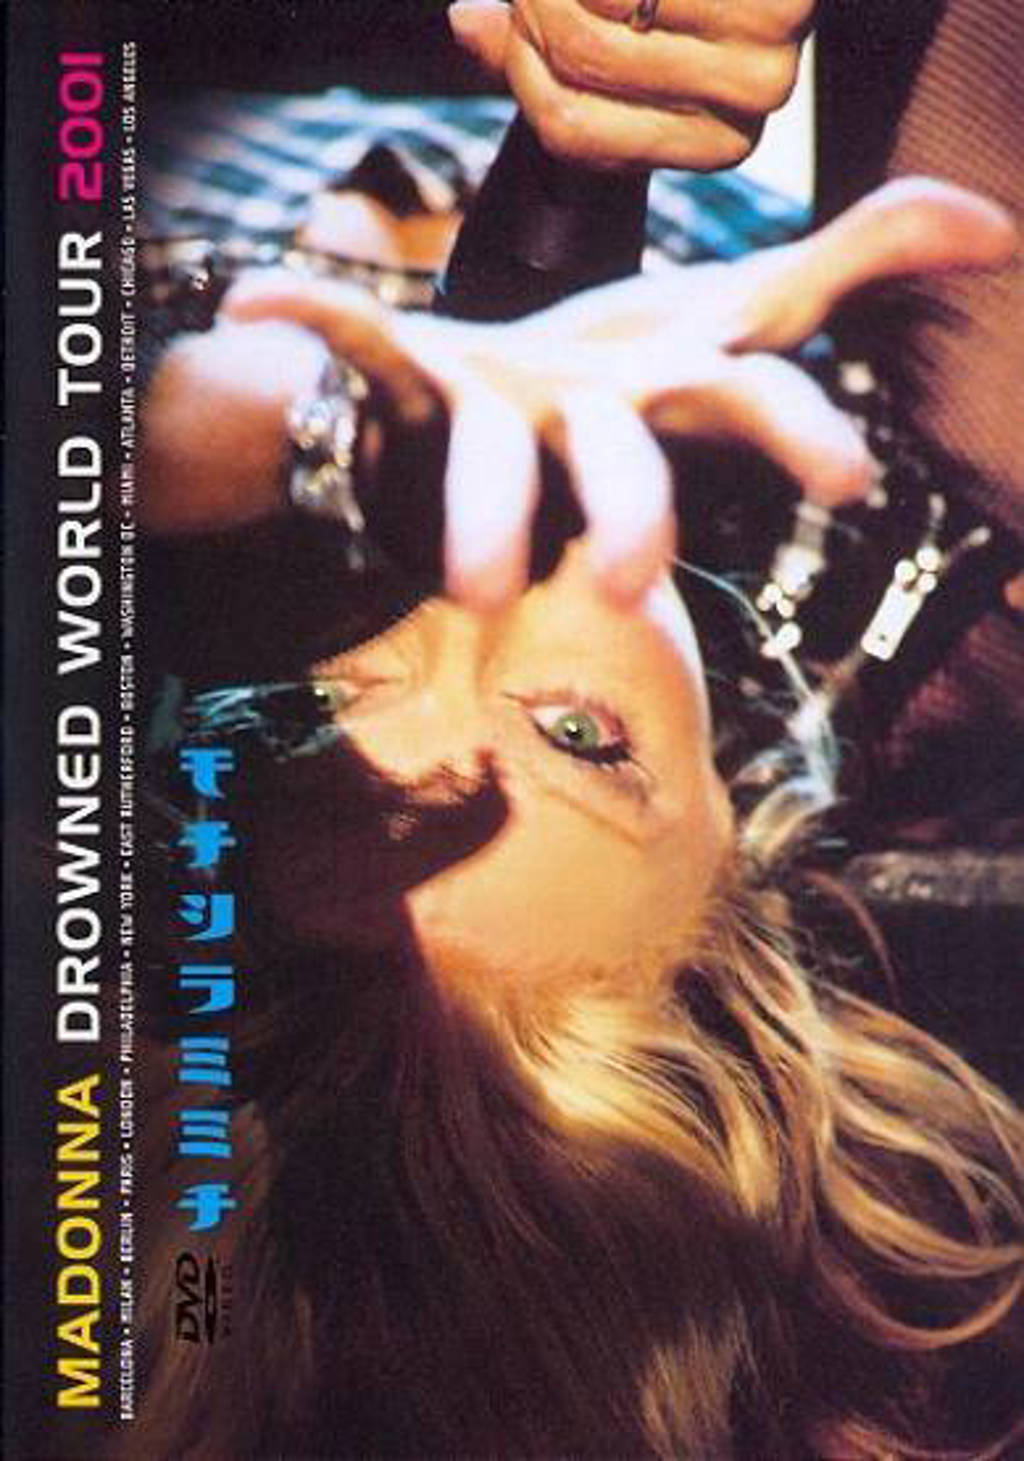 Madonna - Drowned World Tour (DVD)